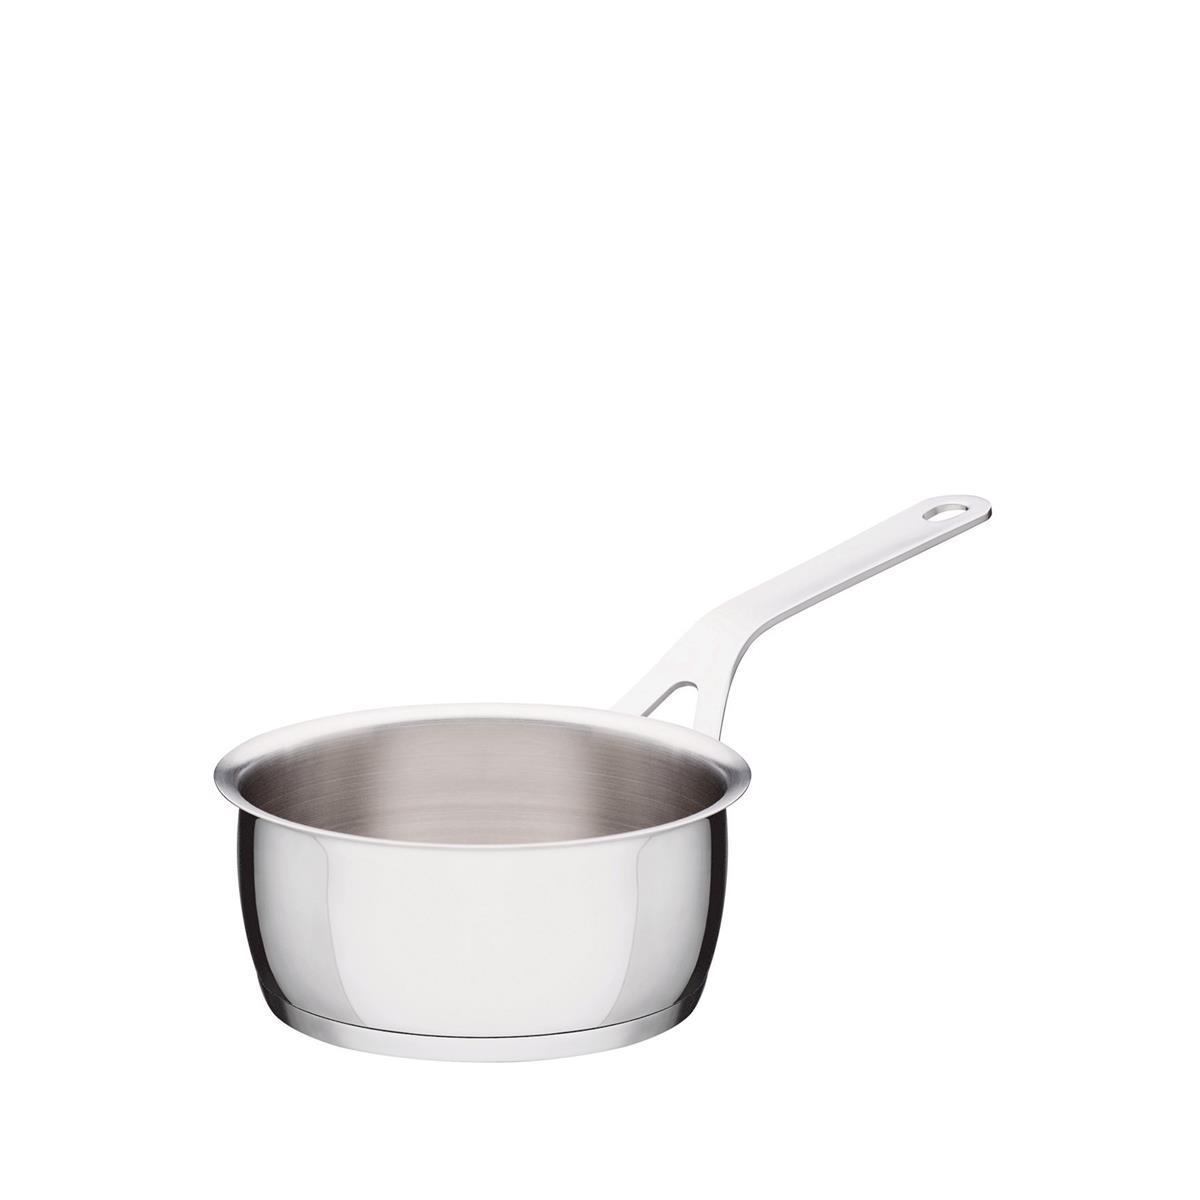 Alessi-Pots&Pans Casseruola in acciaio inox 18/10 adatto a induzione